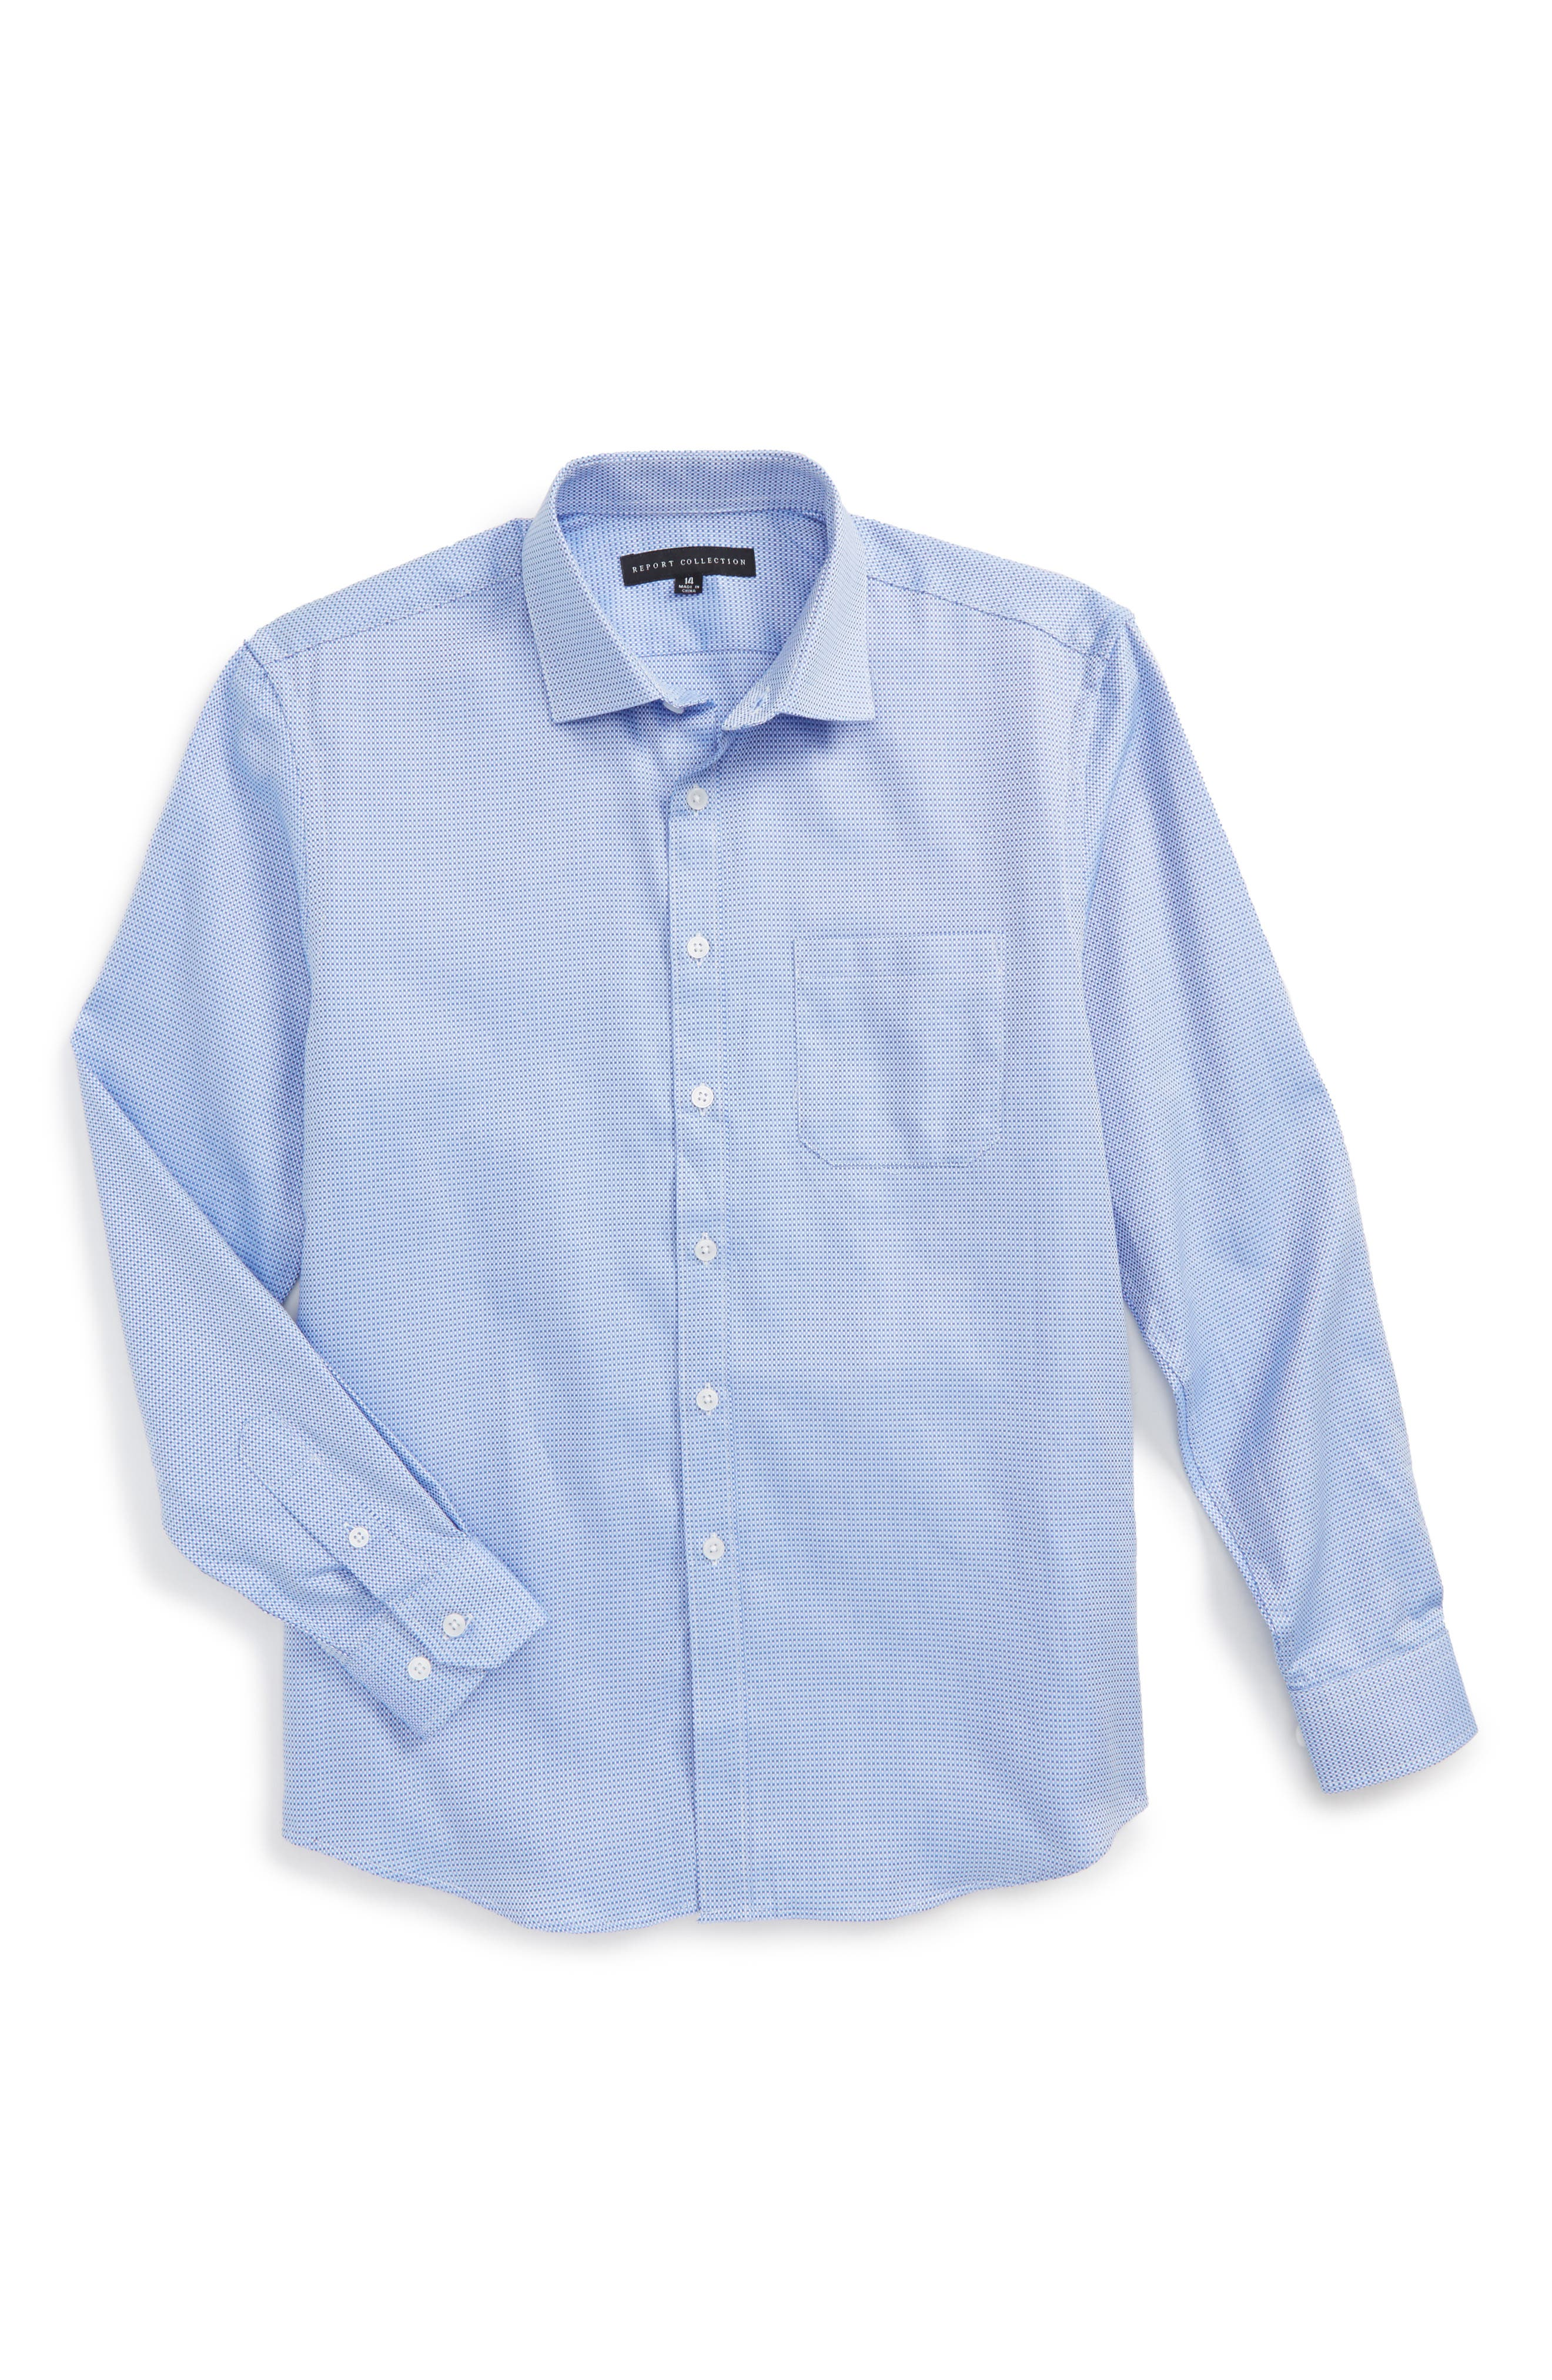 Main Image - Report Collection Textured Dress Shirt (Big Boys)